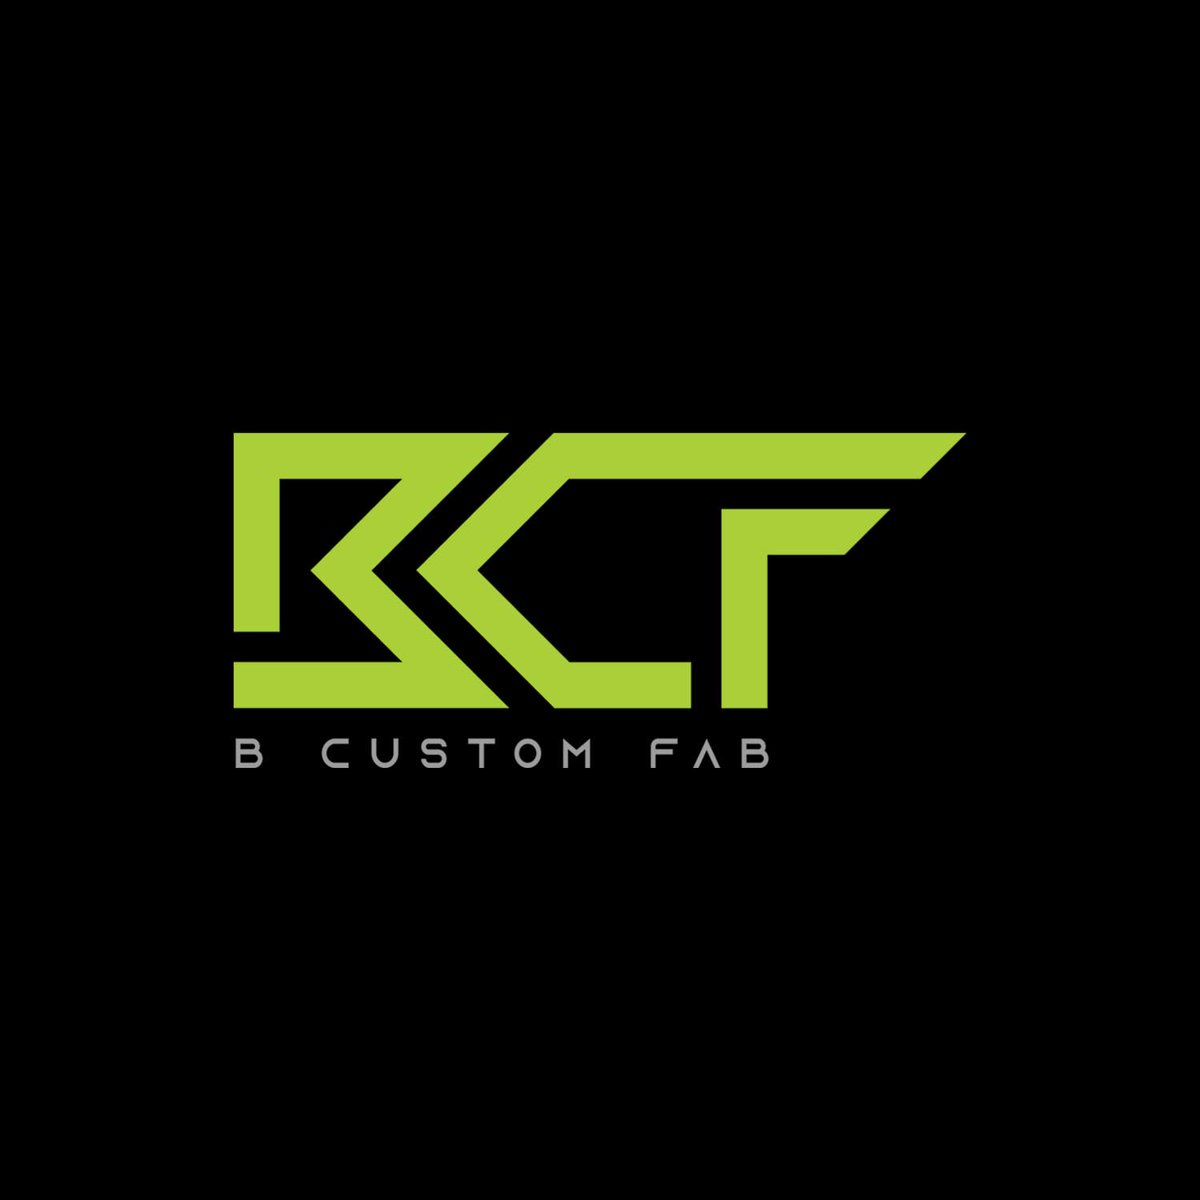 B Custom Fab